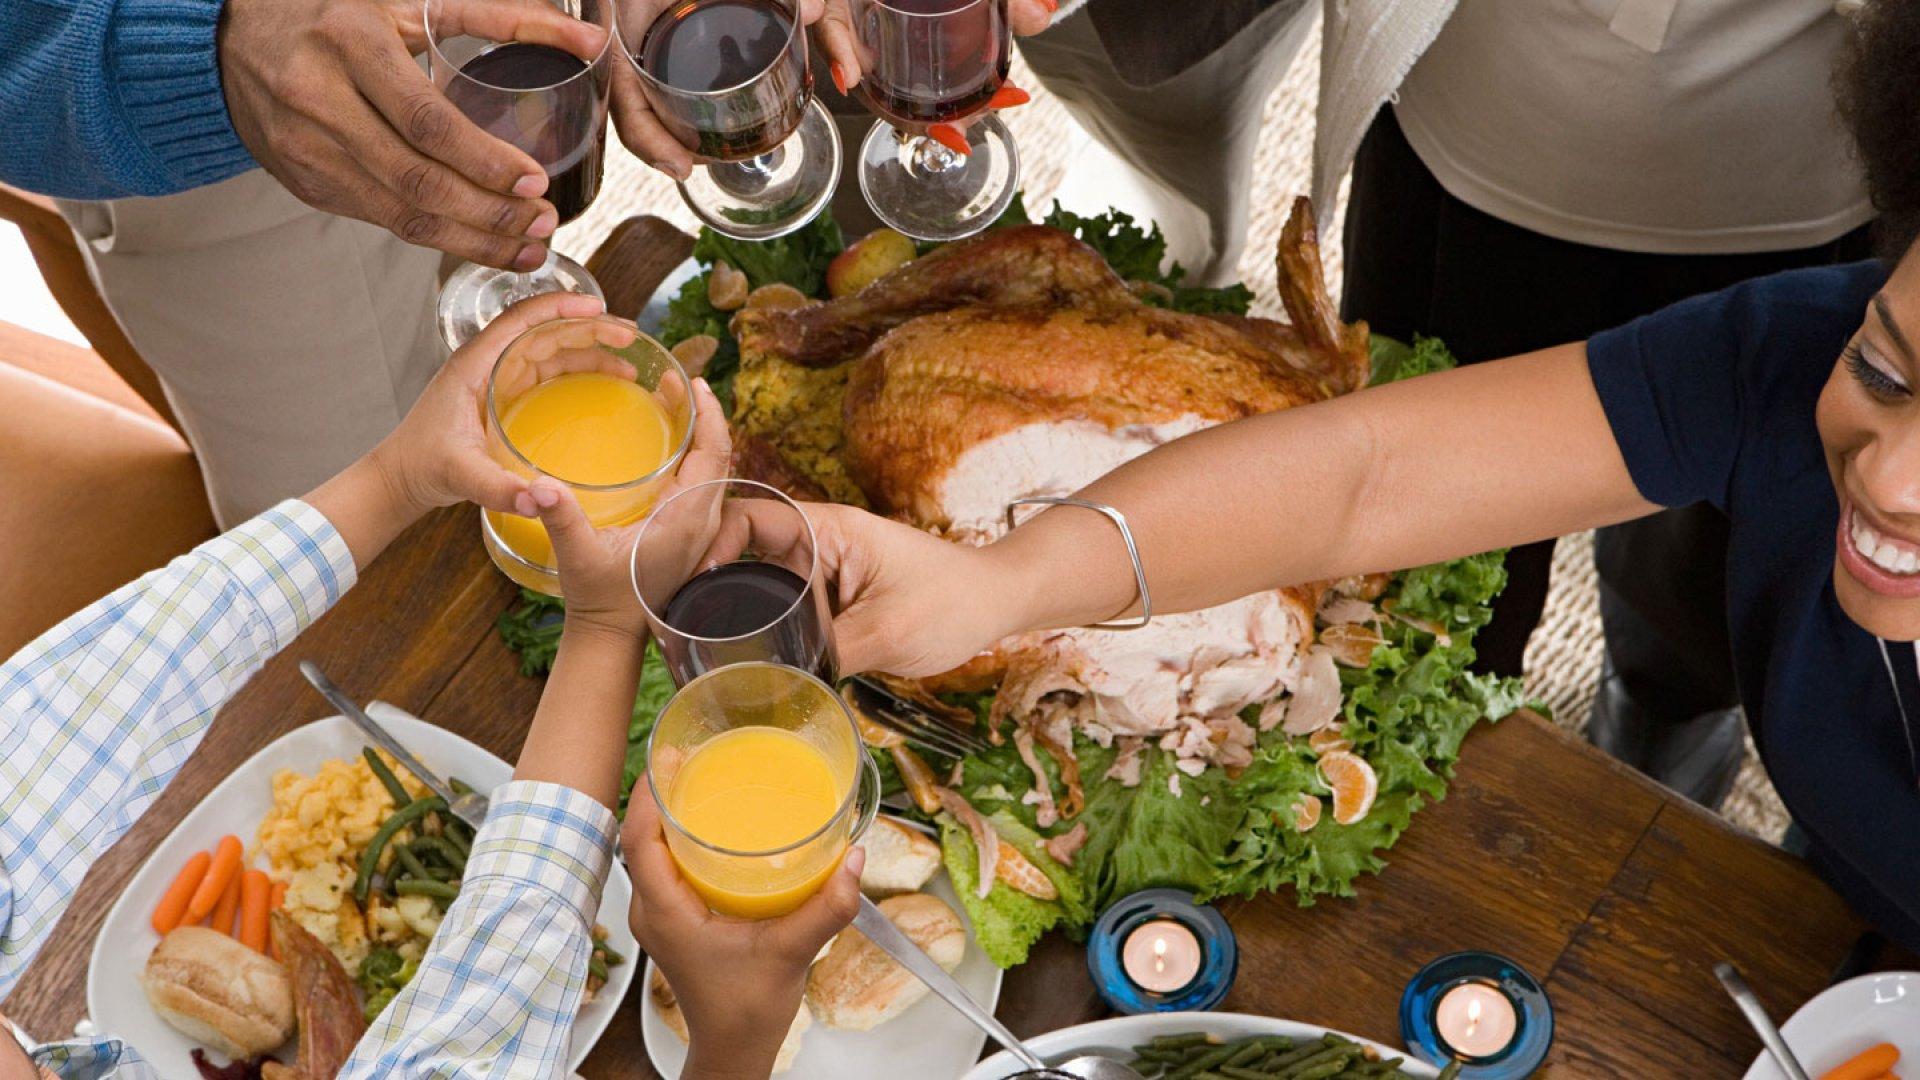 3 Reasons to Treat Employees Like Family